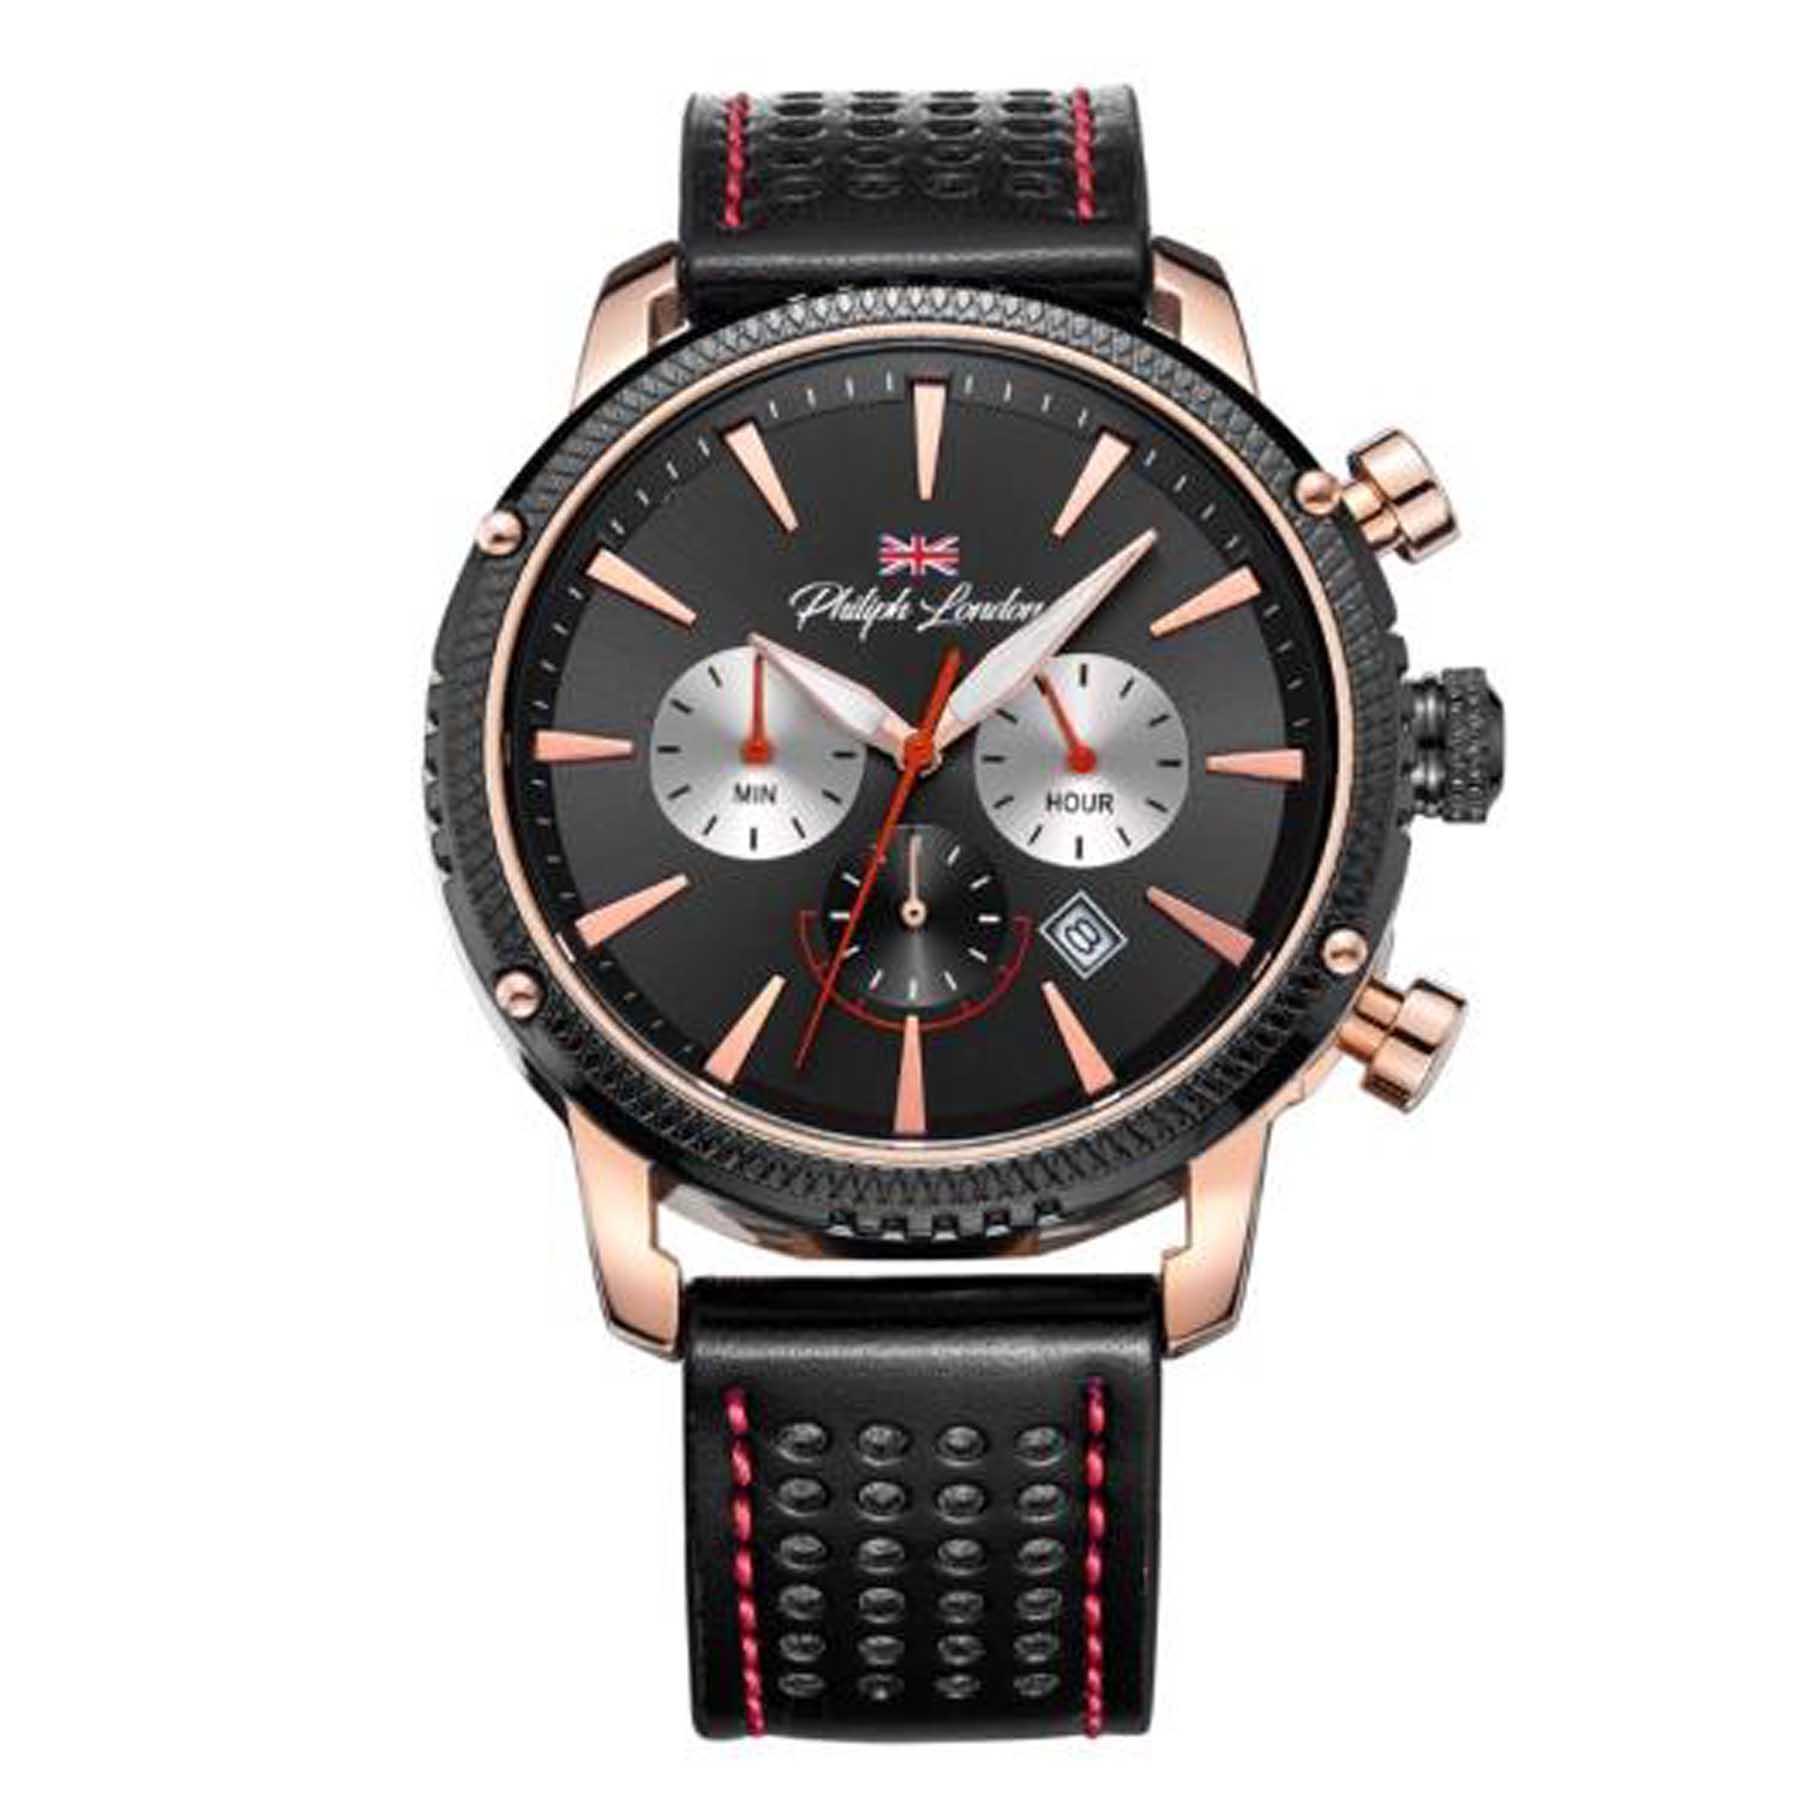 Relógio Philiph London Analógico Masculino PL80002632M